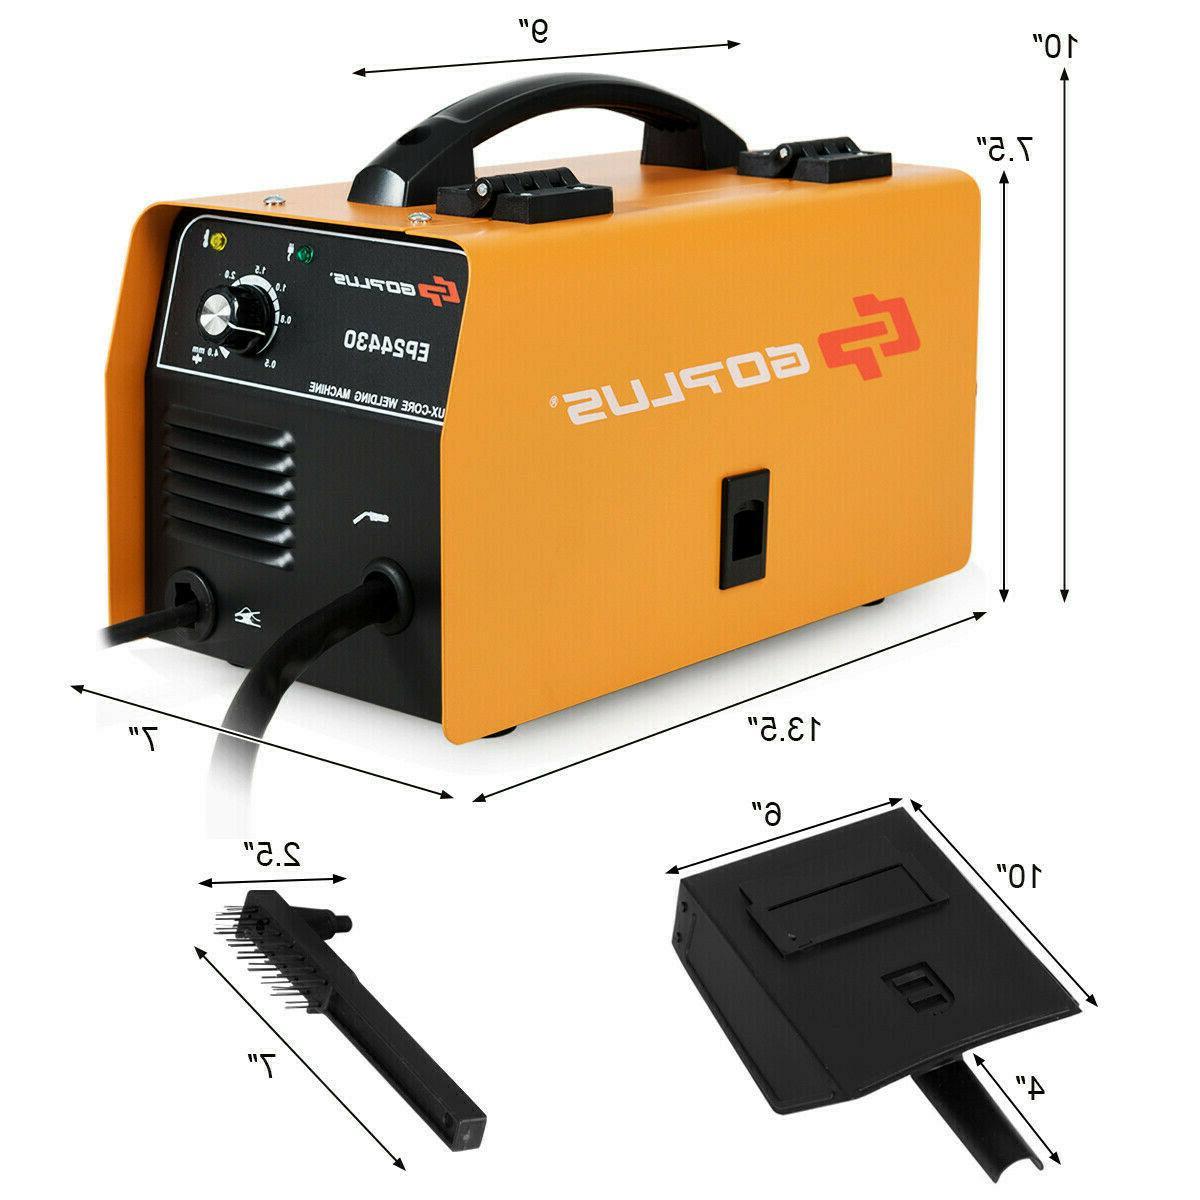 130 MIG Flux Core Automatic Welding Machine Free Orange